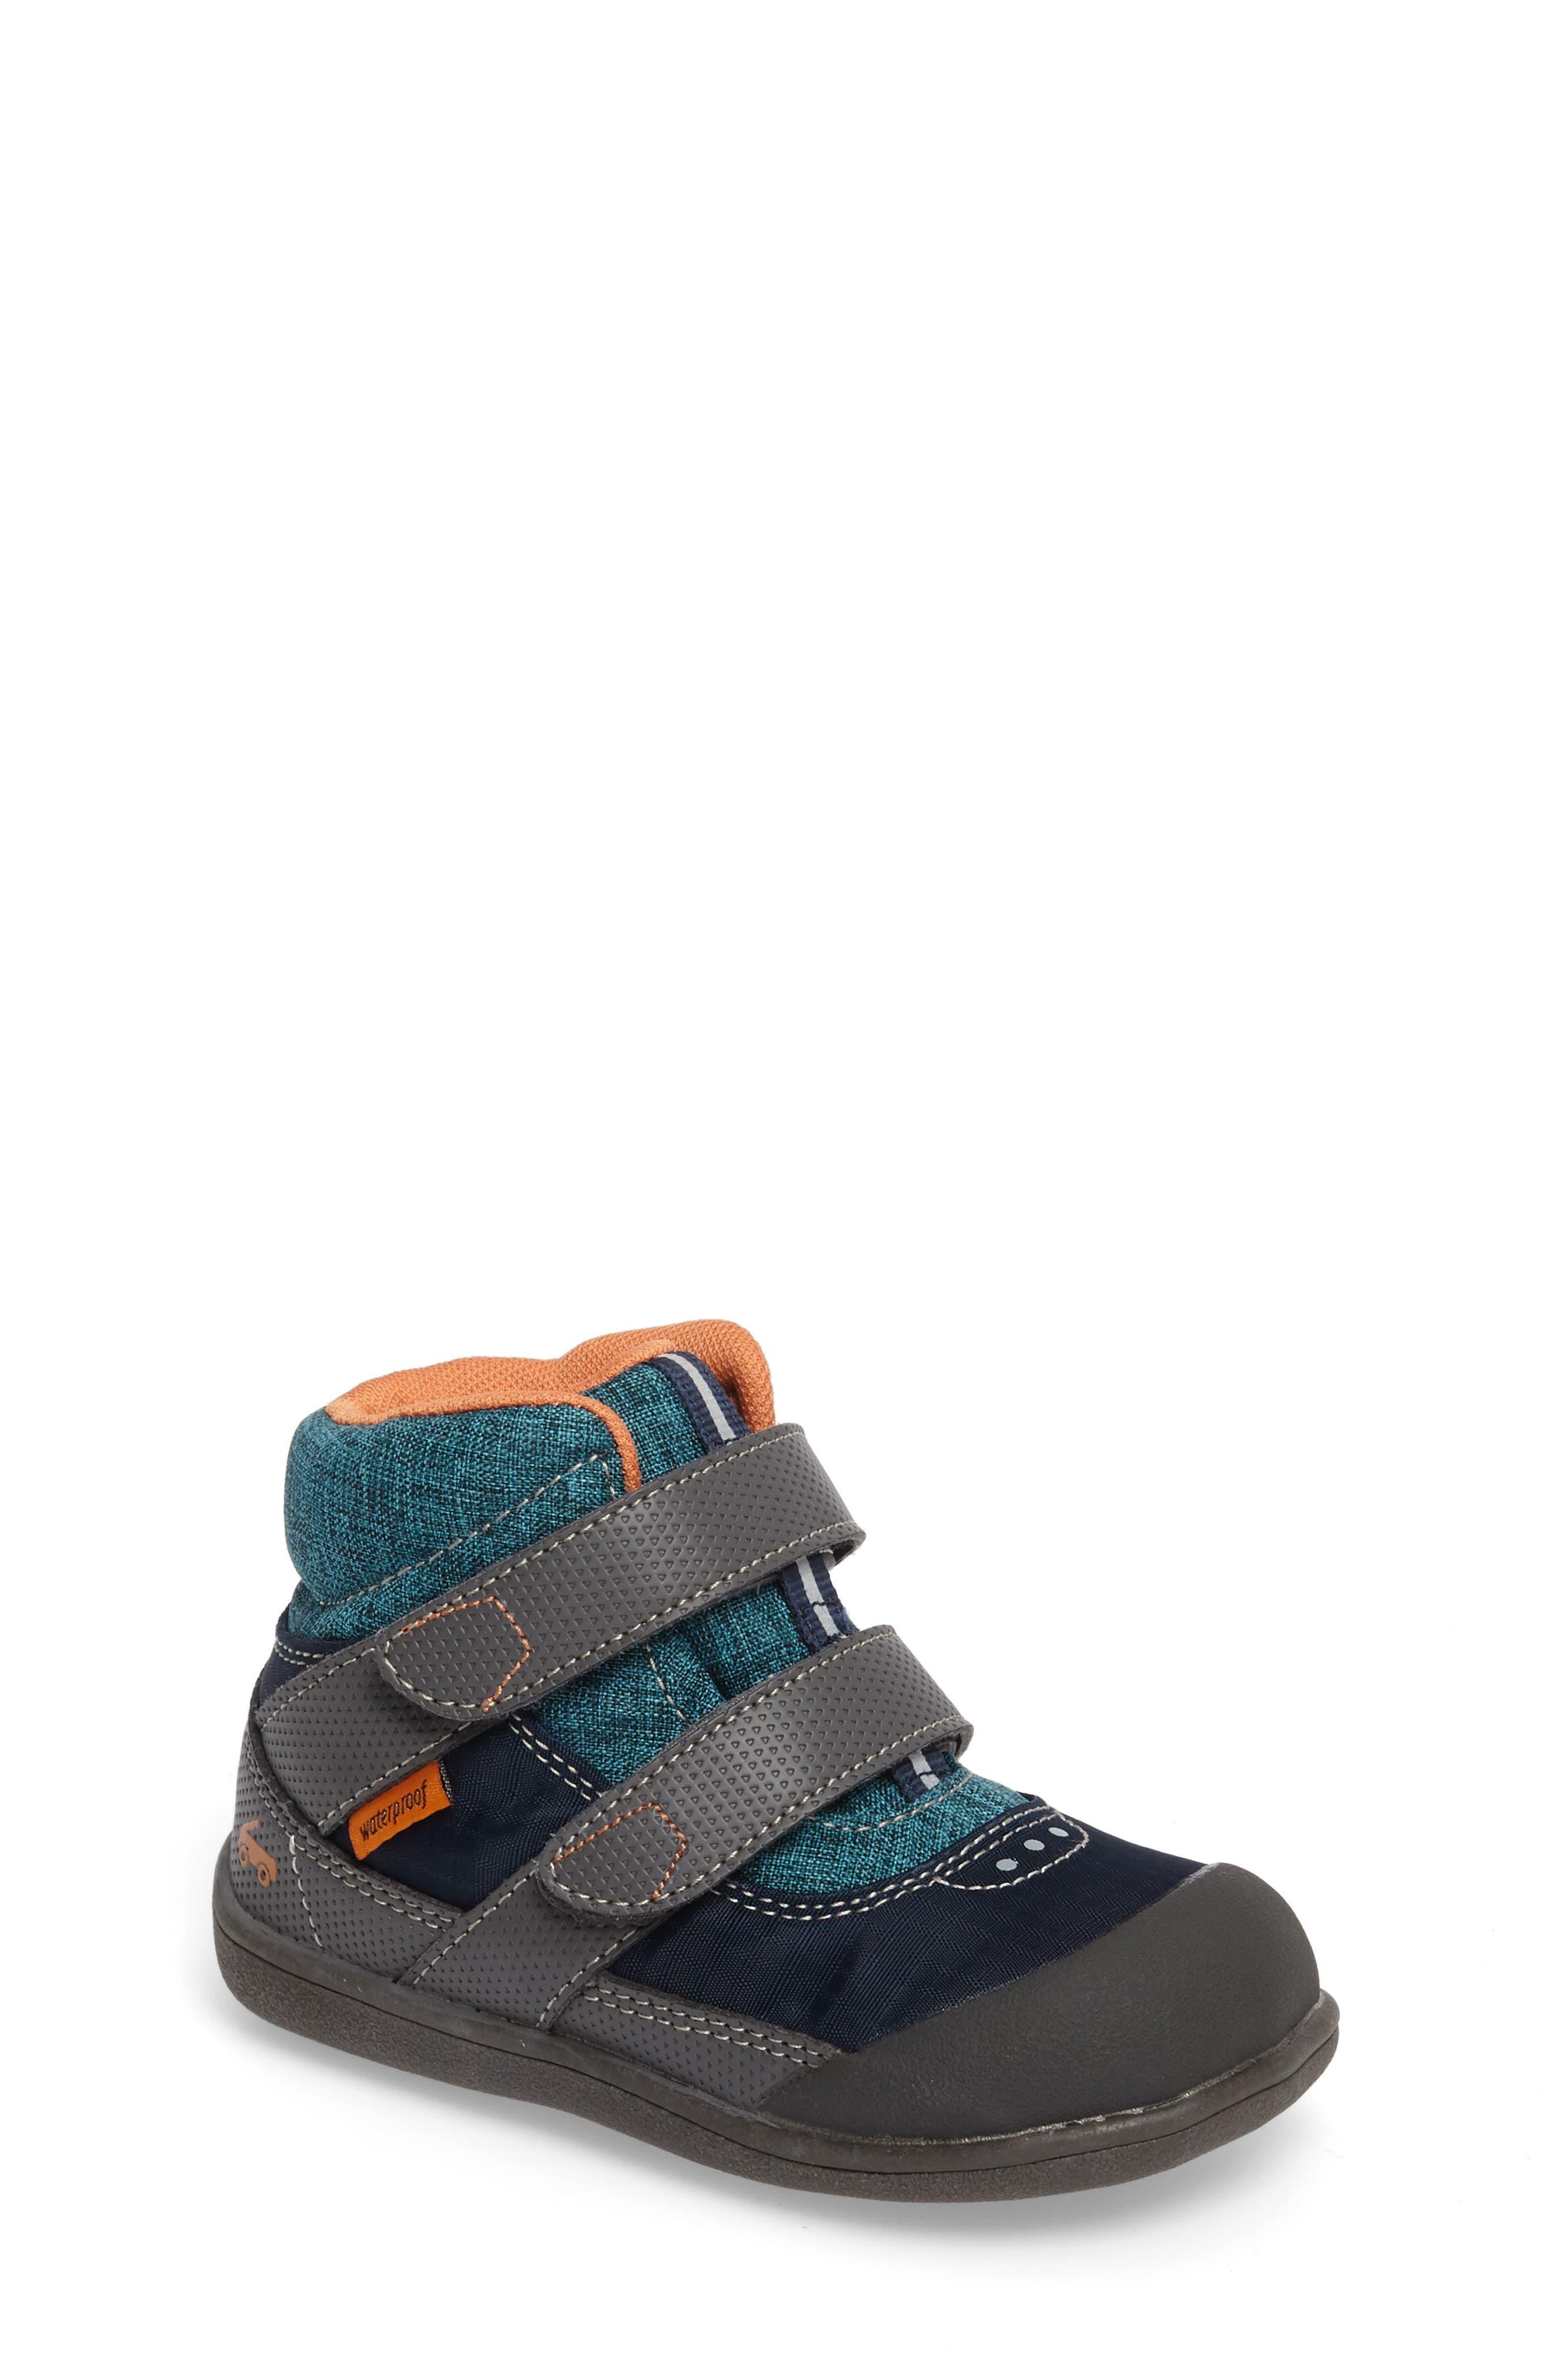 Atlas Waterproof Boot,                         Main,                         color,